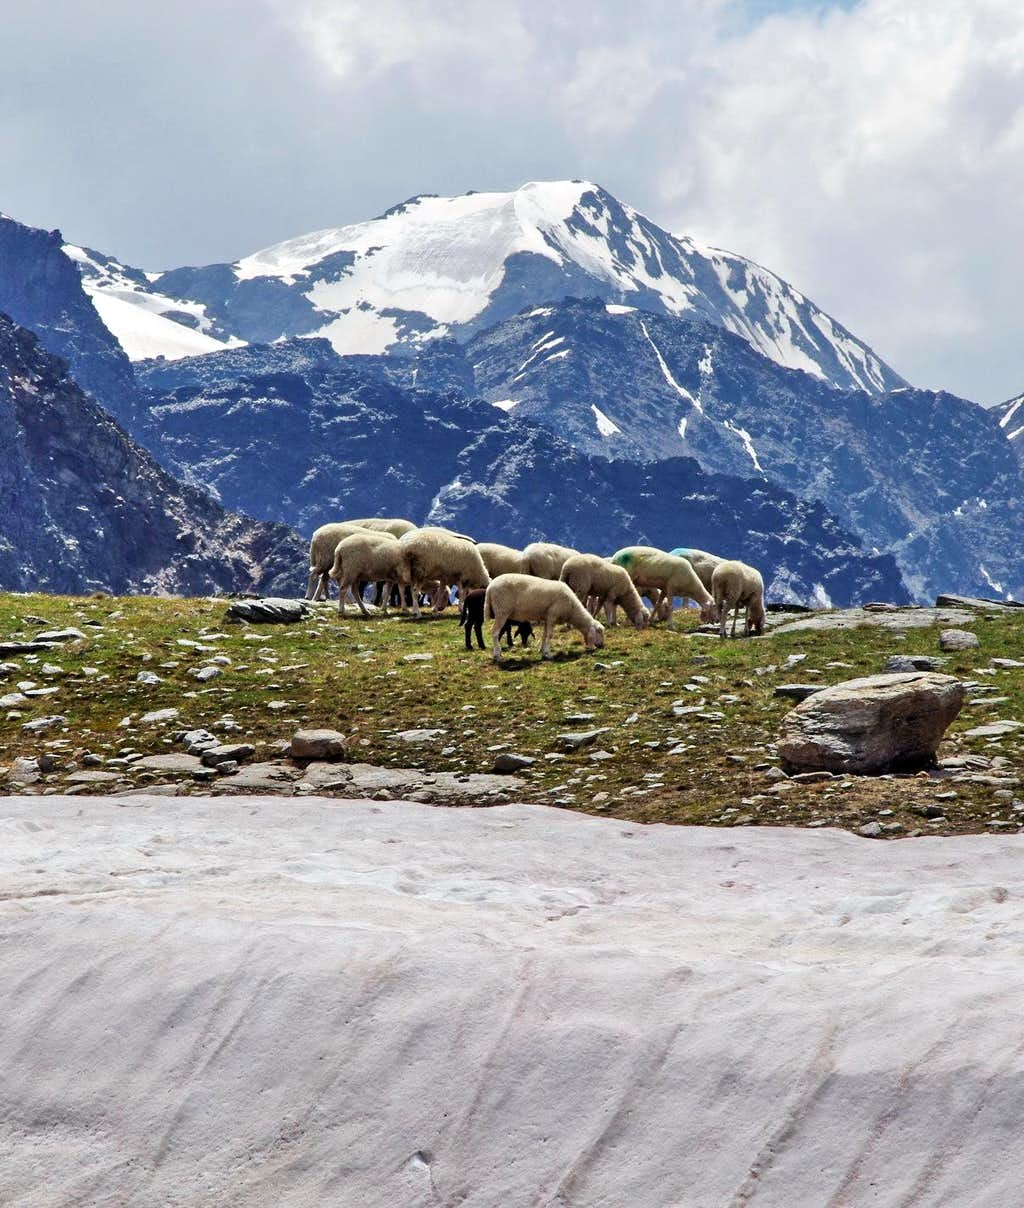 Flock of sheep grazing in Zai Valley/Zaytal